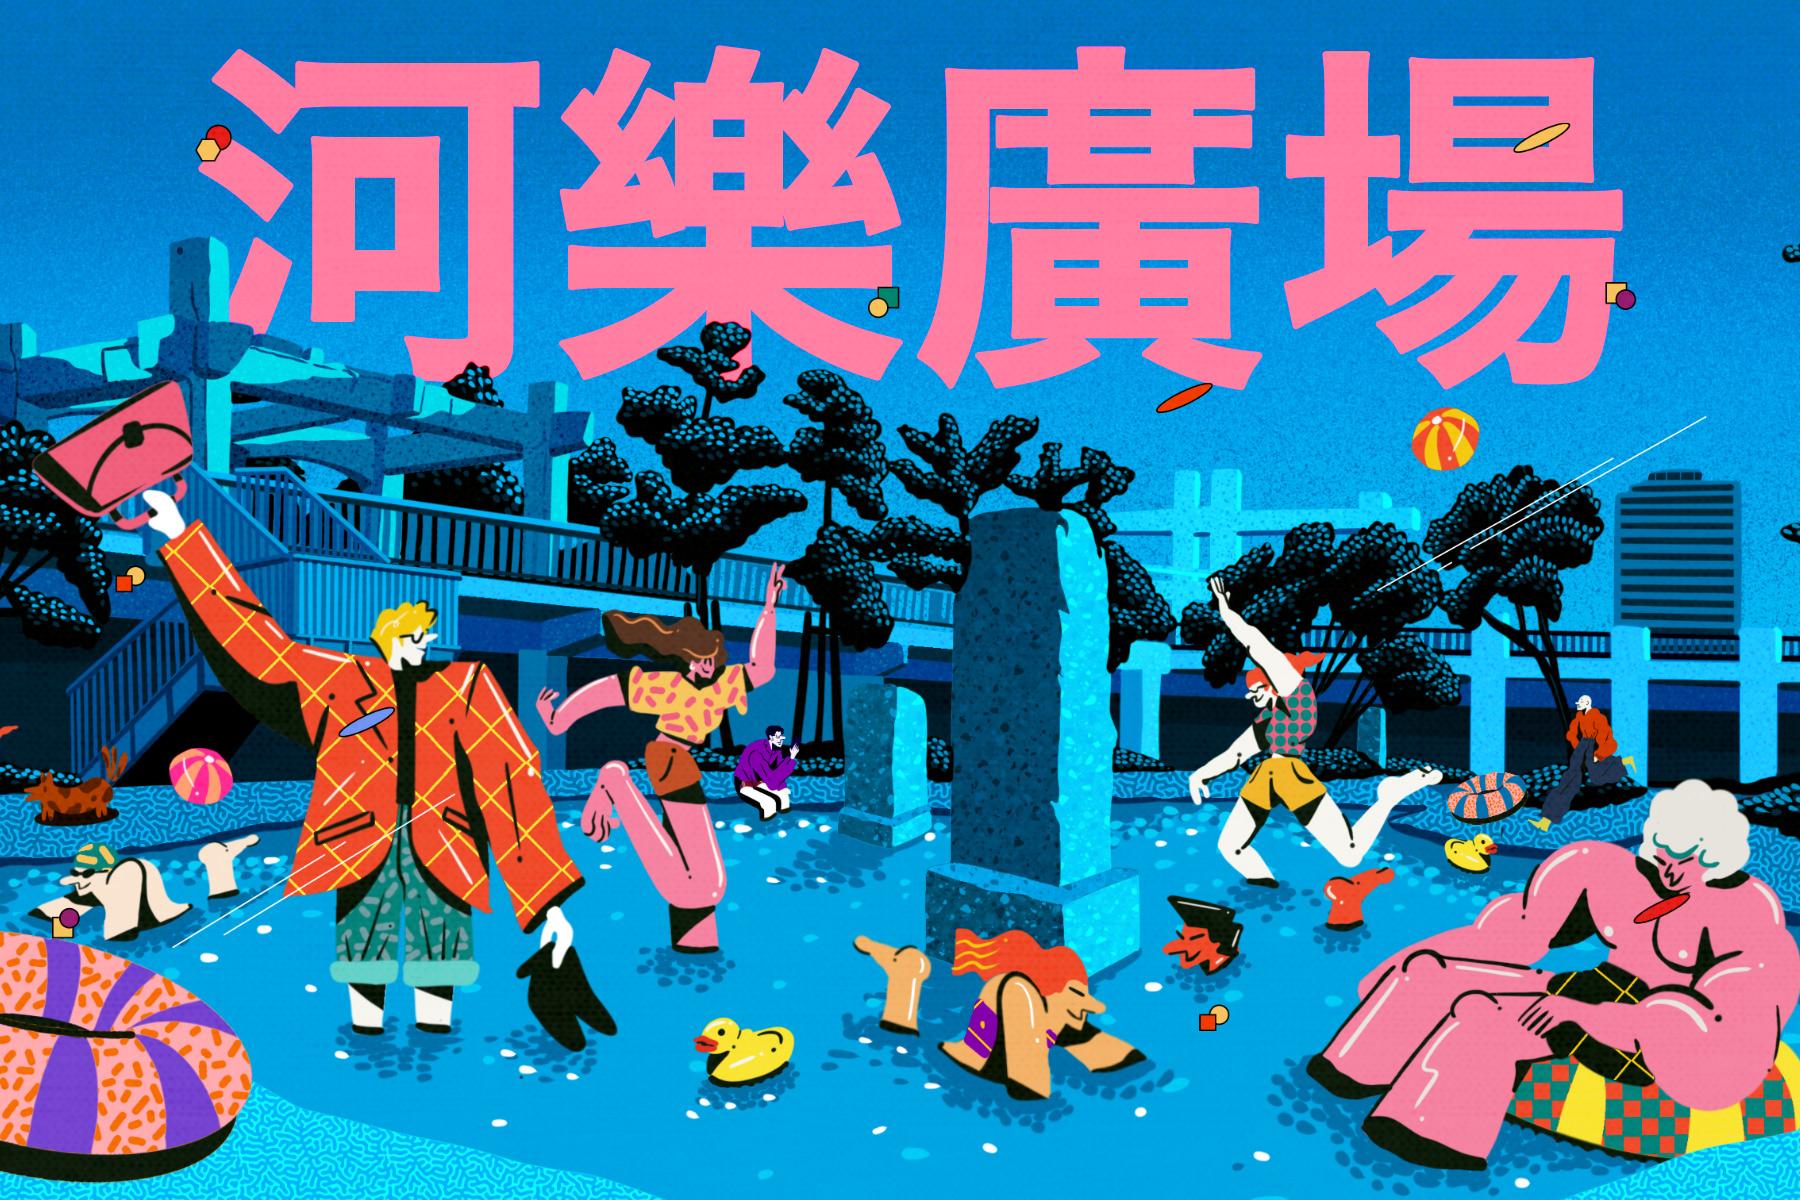 Tainan Spring ลานเล่นน้ำสาธารณะที่ชุบชีวิตห้างเก่าและชุบใจคนเมืองไถหนันไปพร้อมกัน